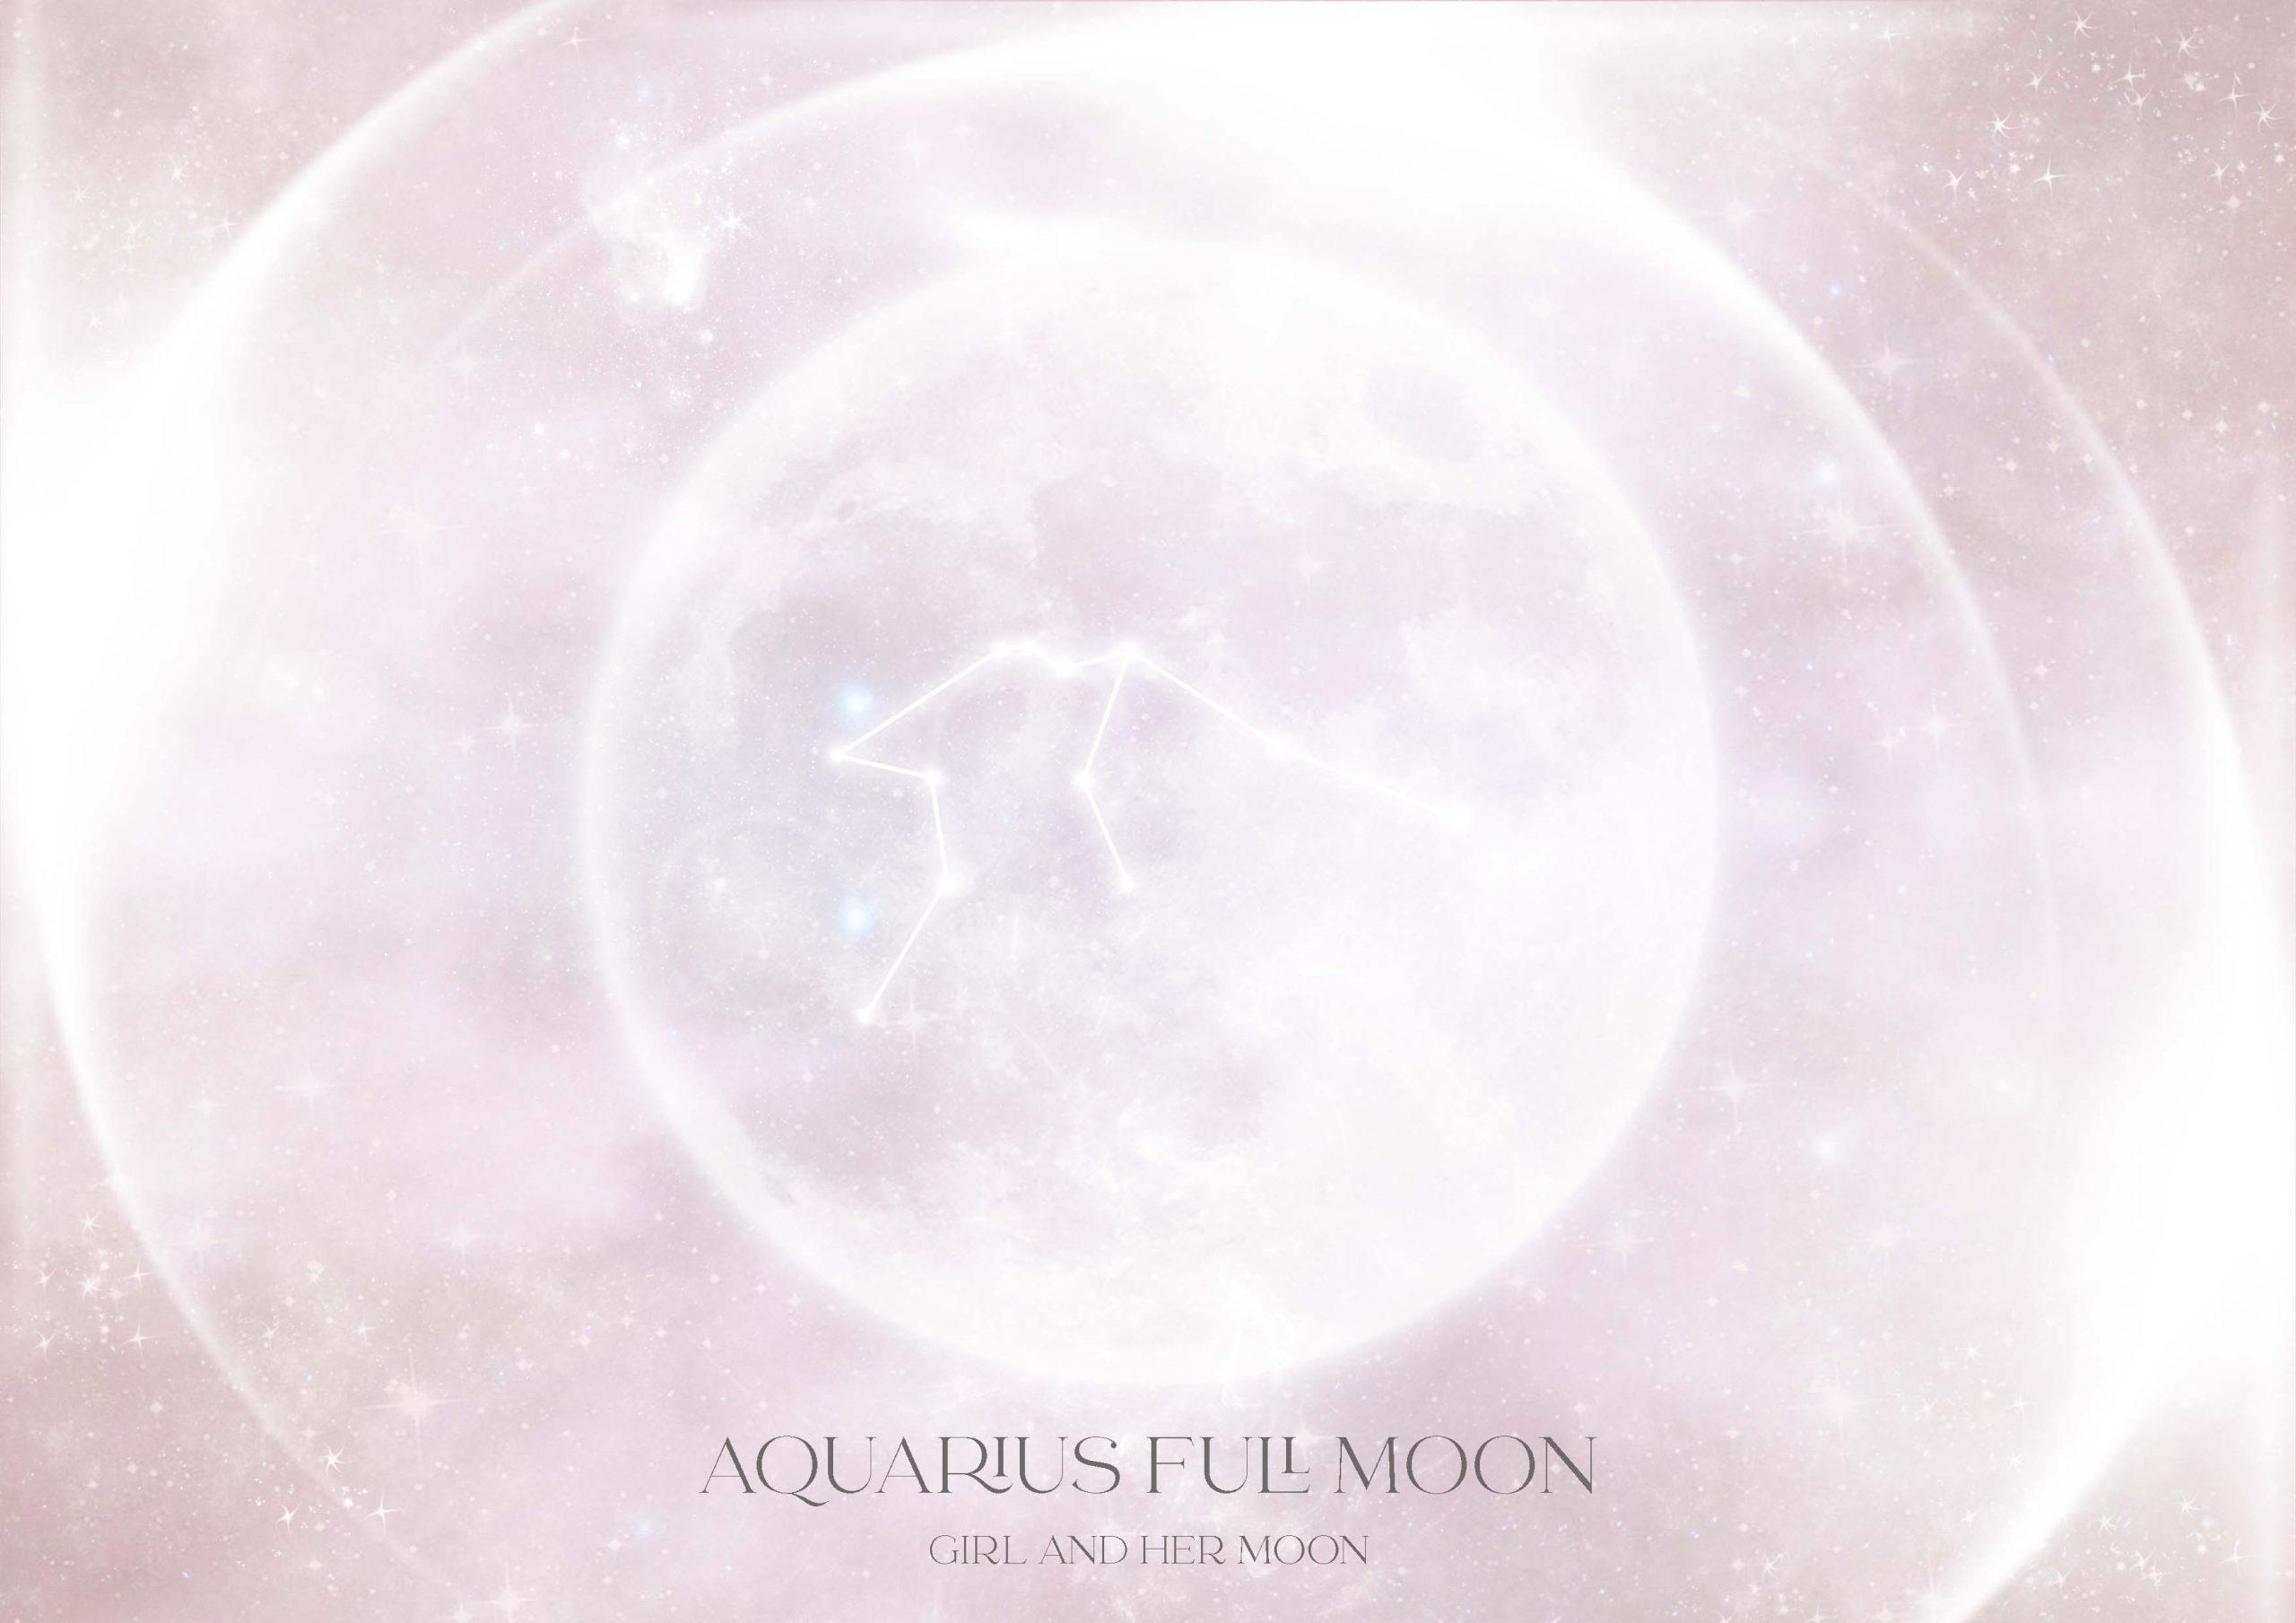 Aquarius Full Moon August 2021 Girl and Her Moon